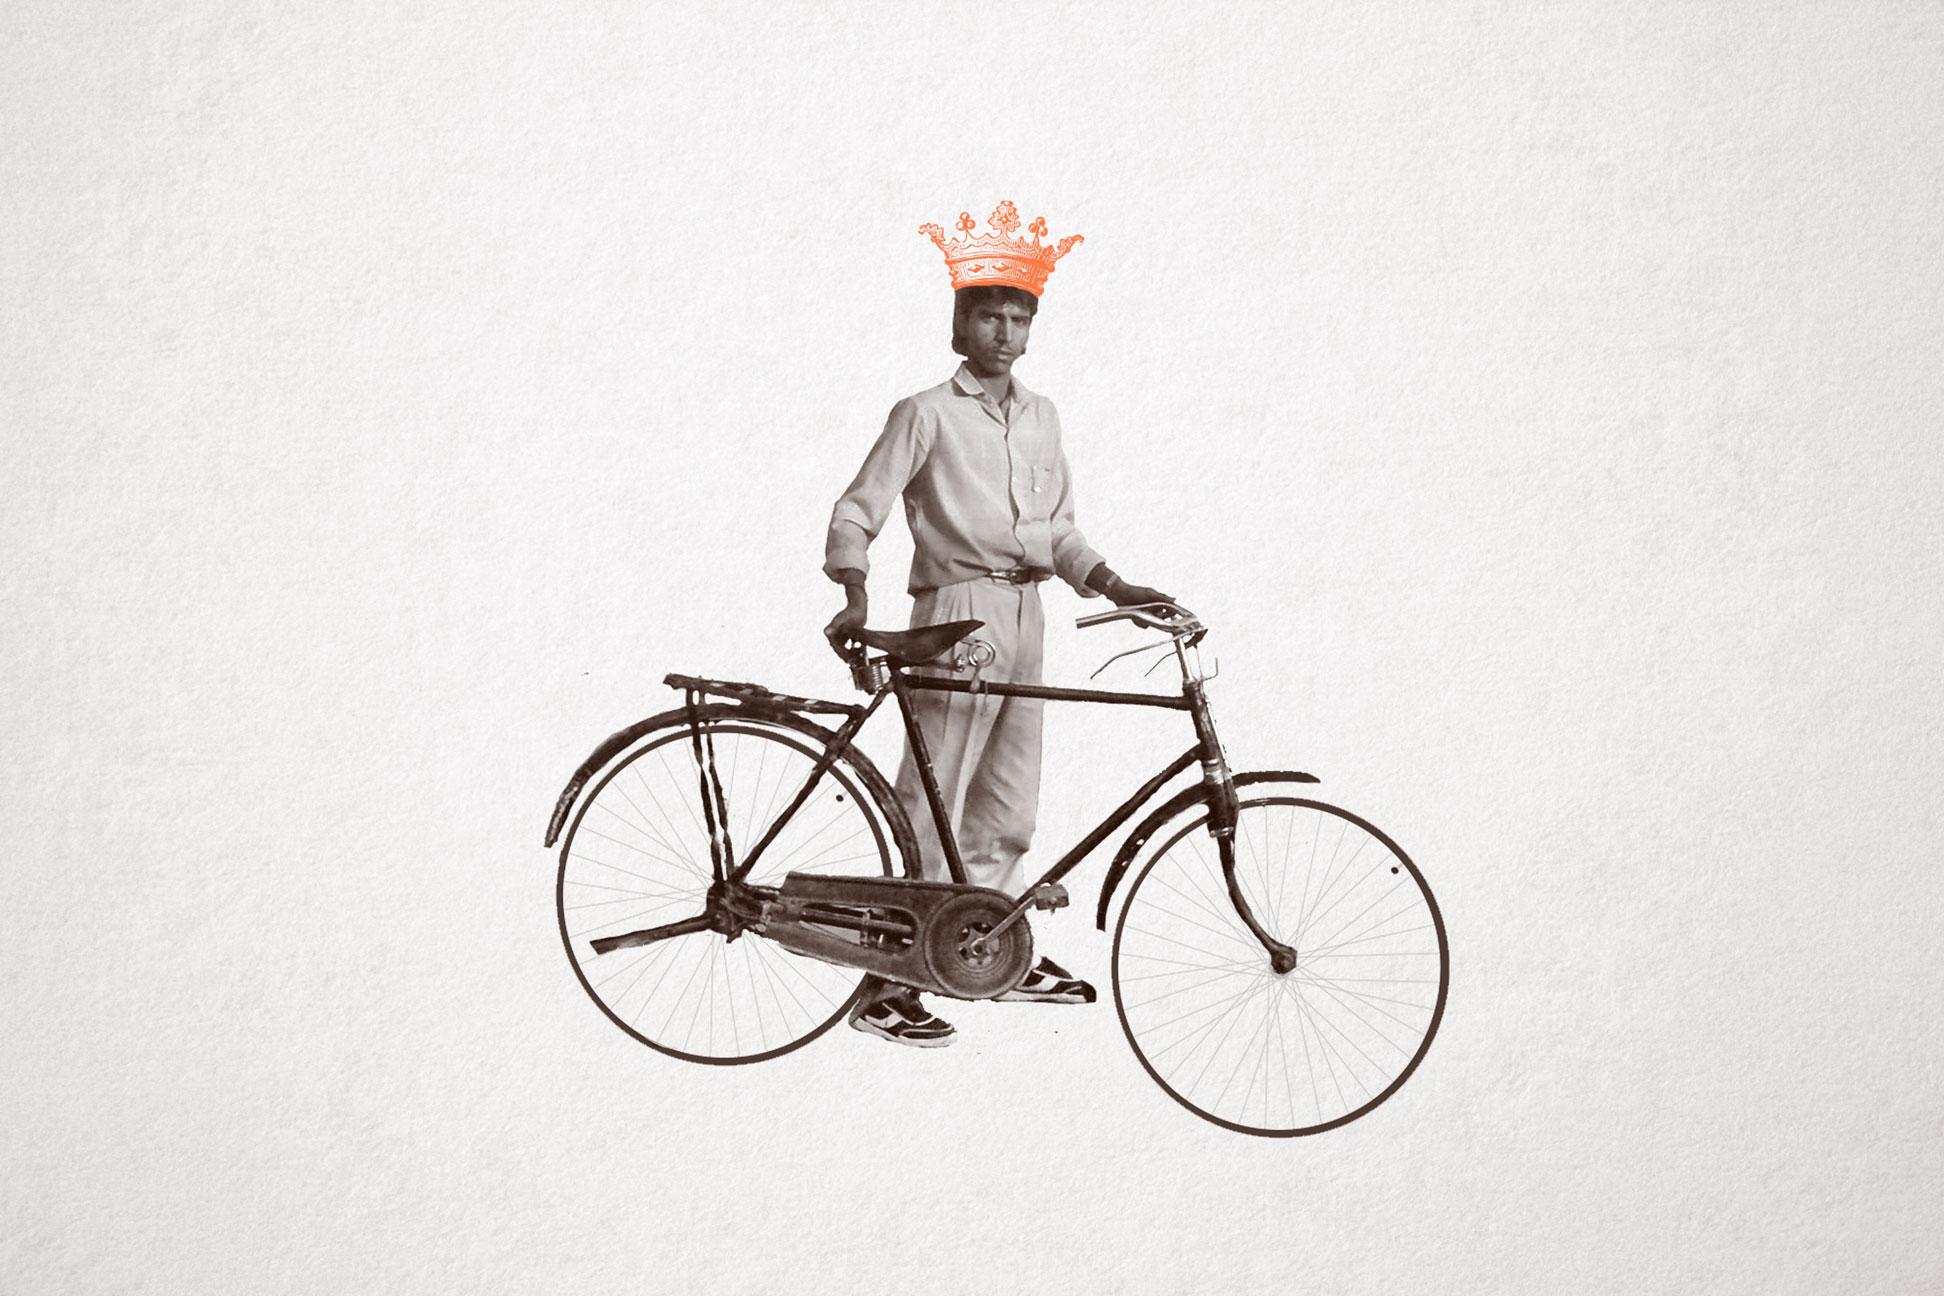 Boy-With-Bicycle-Art.jpg